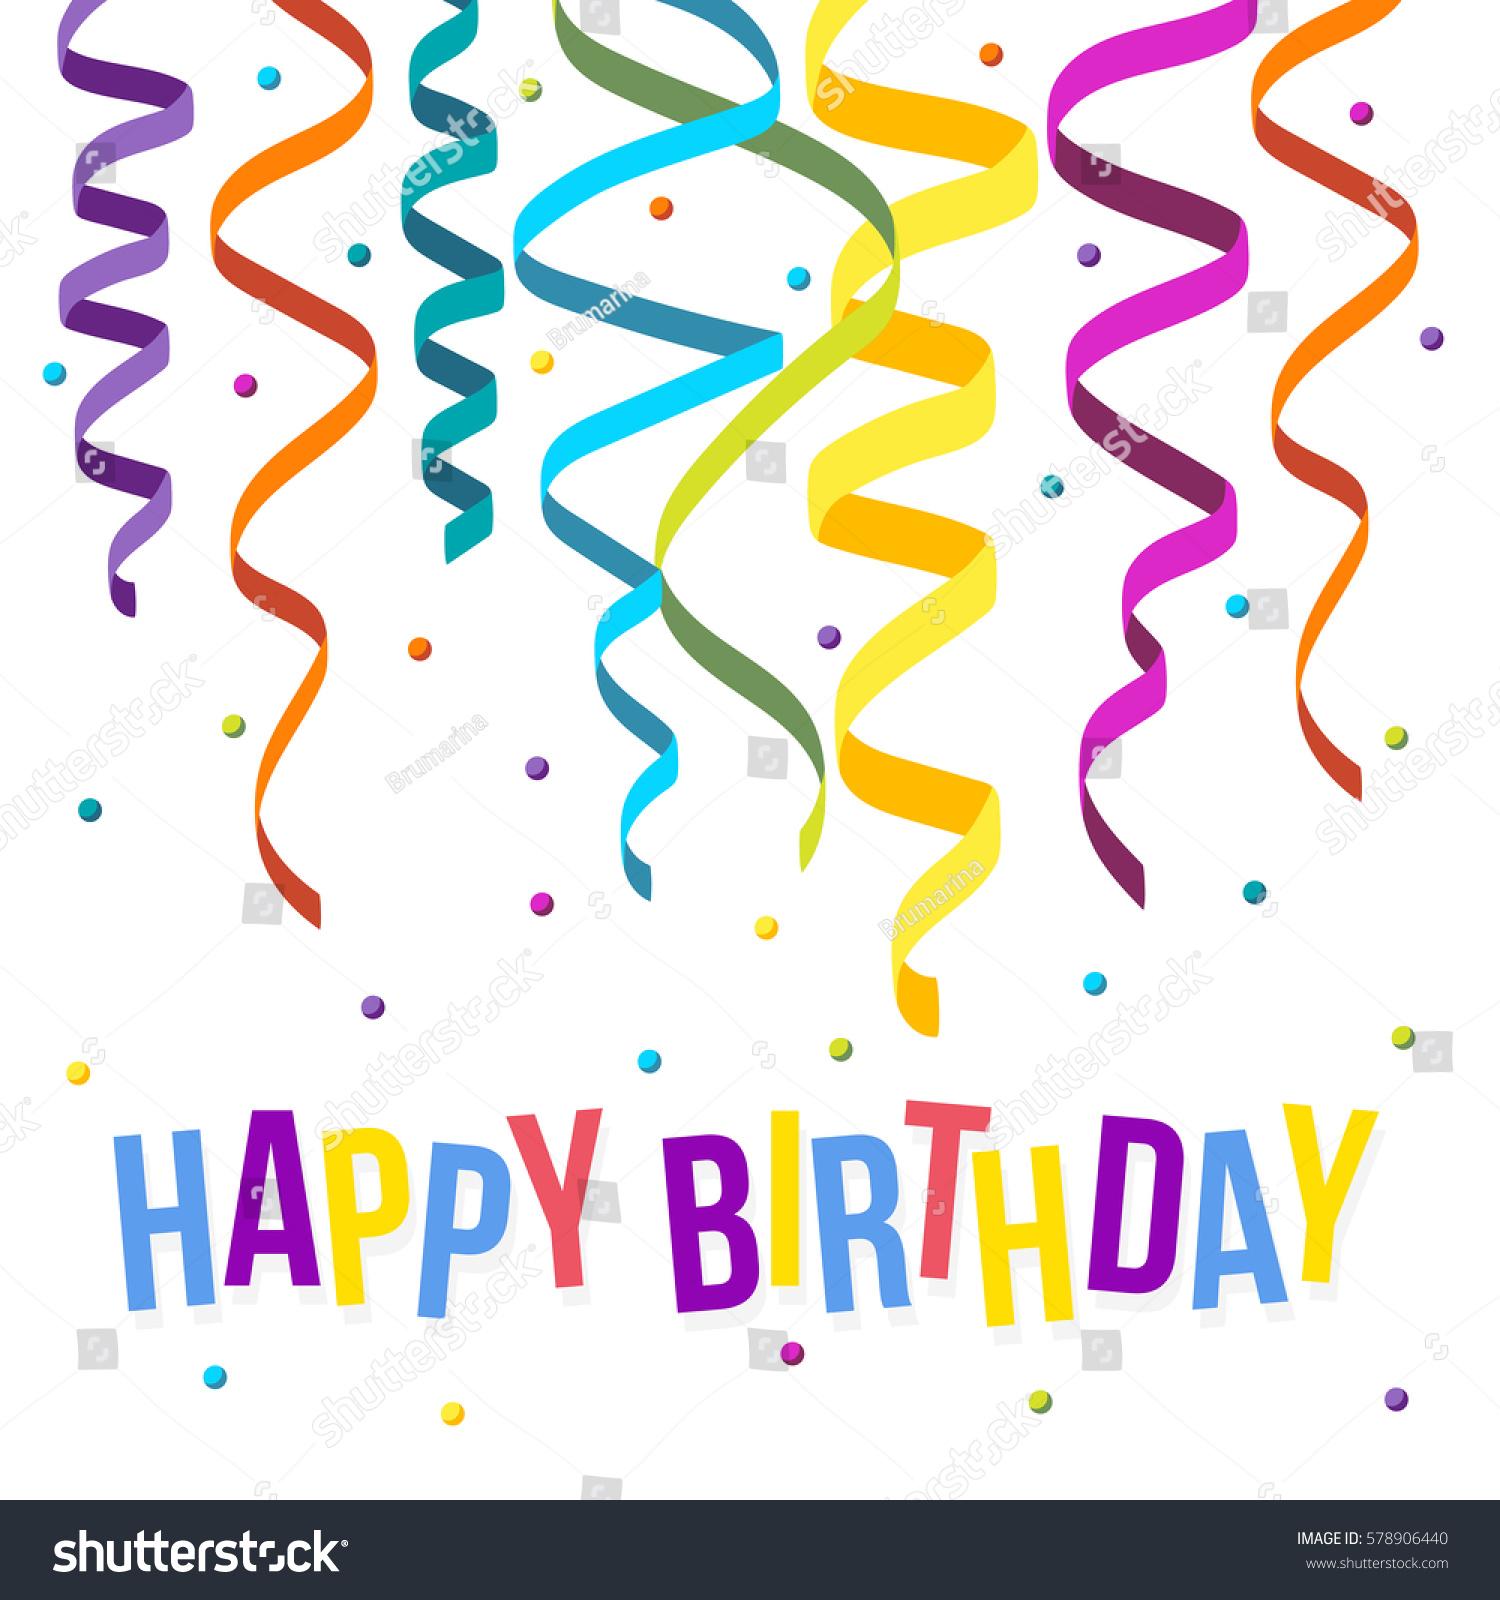 happy birthday card template flat colorful のベクター画像素材